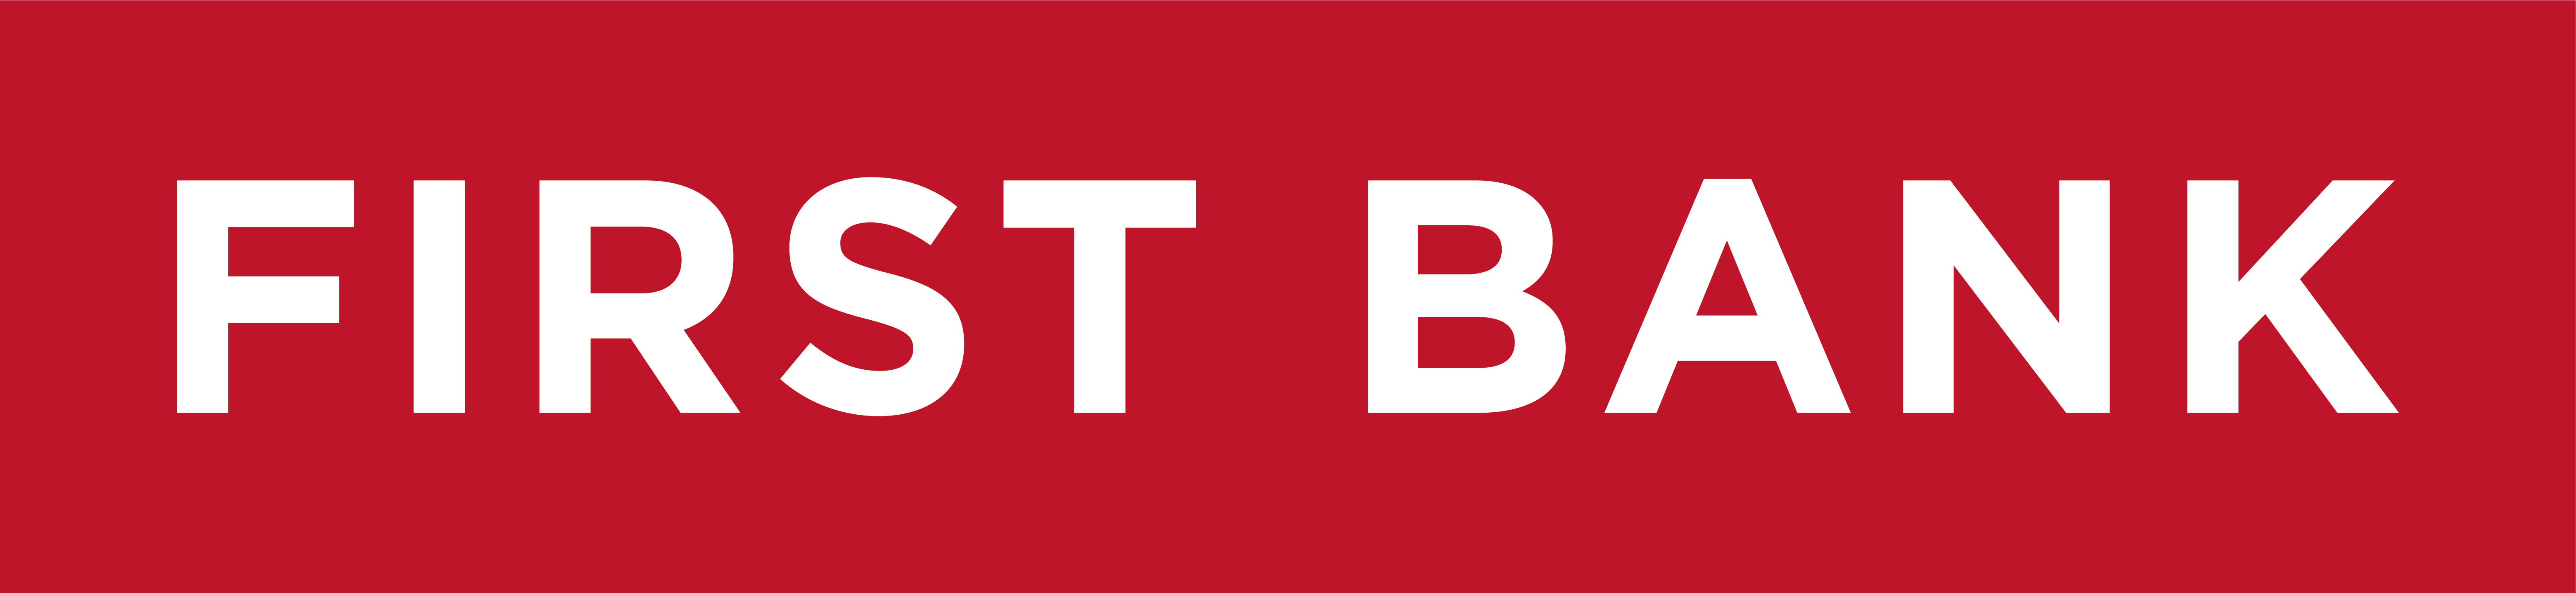 First Bank - Southern Pines, NC Logo